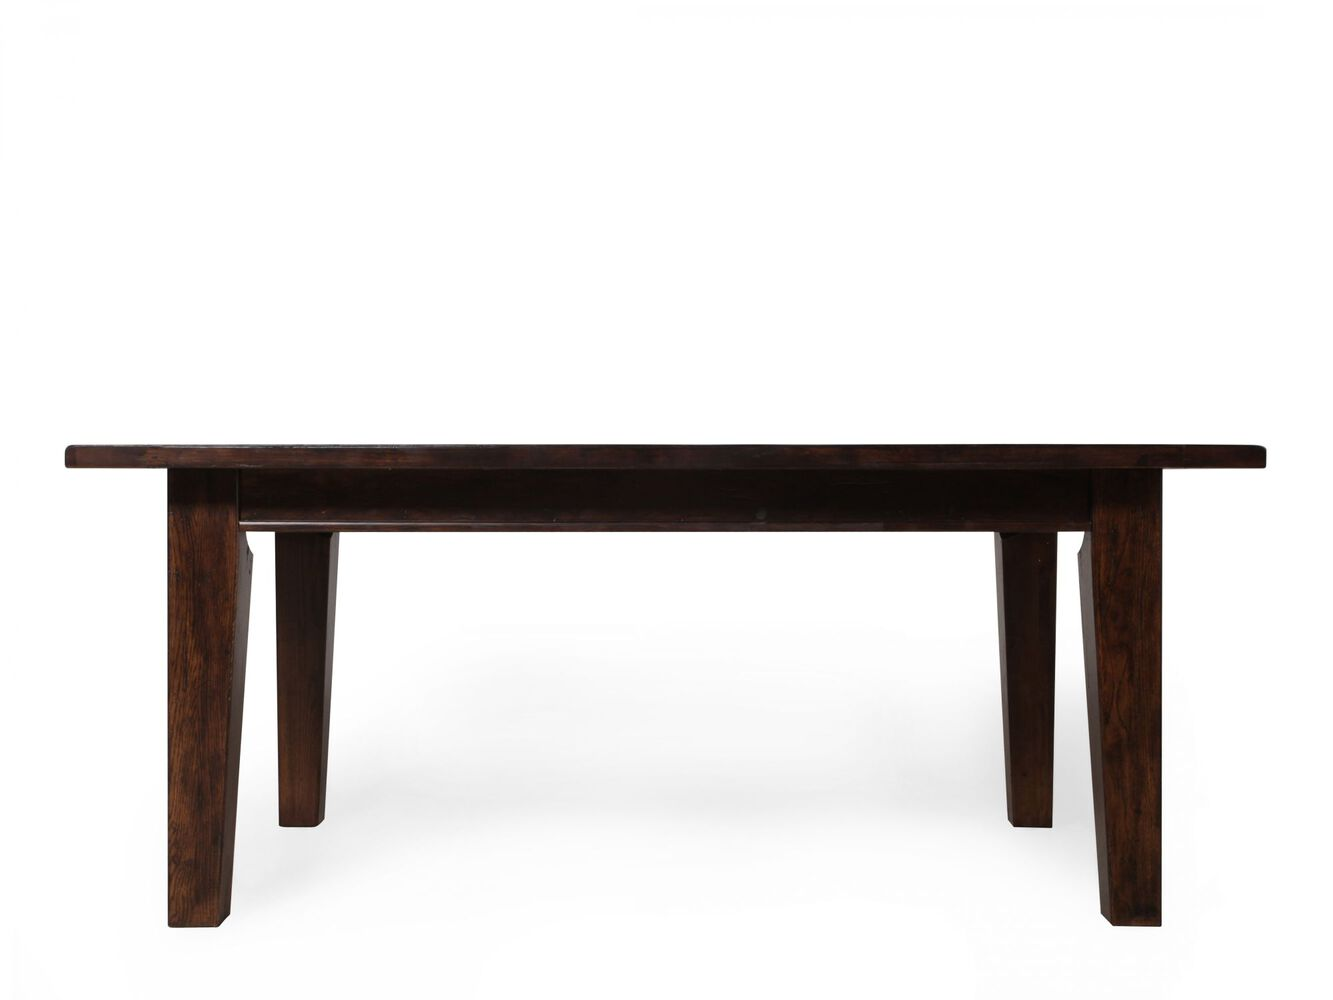 Broyhill Attic Rustic Oak Leg Table Mathis Brothers